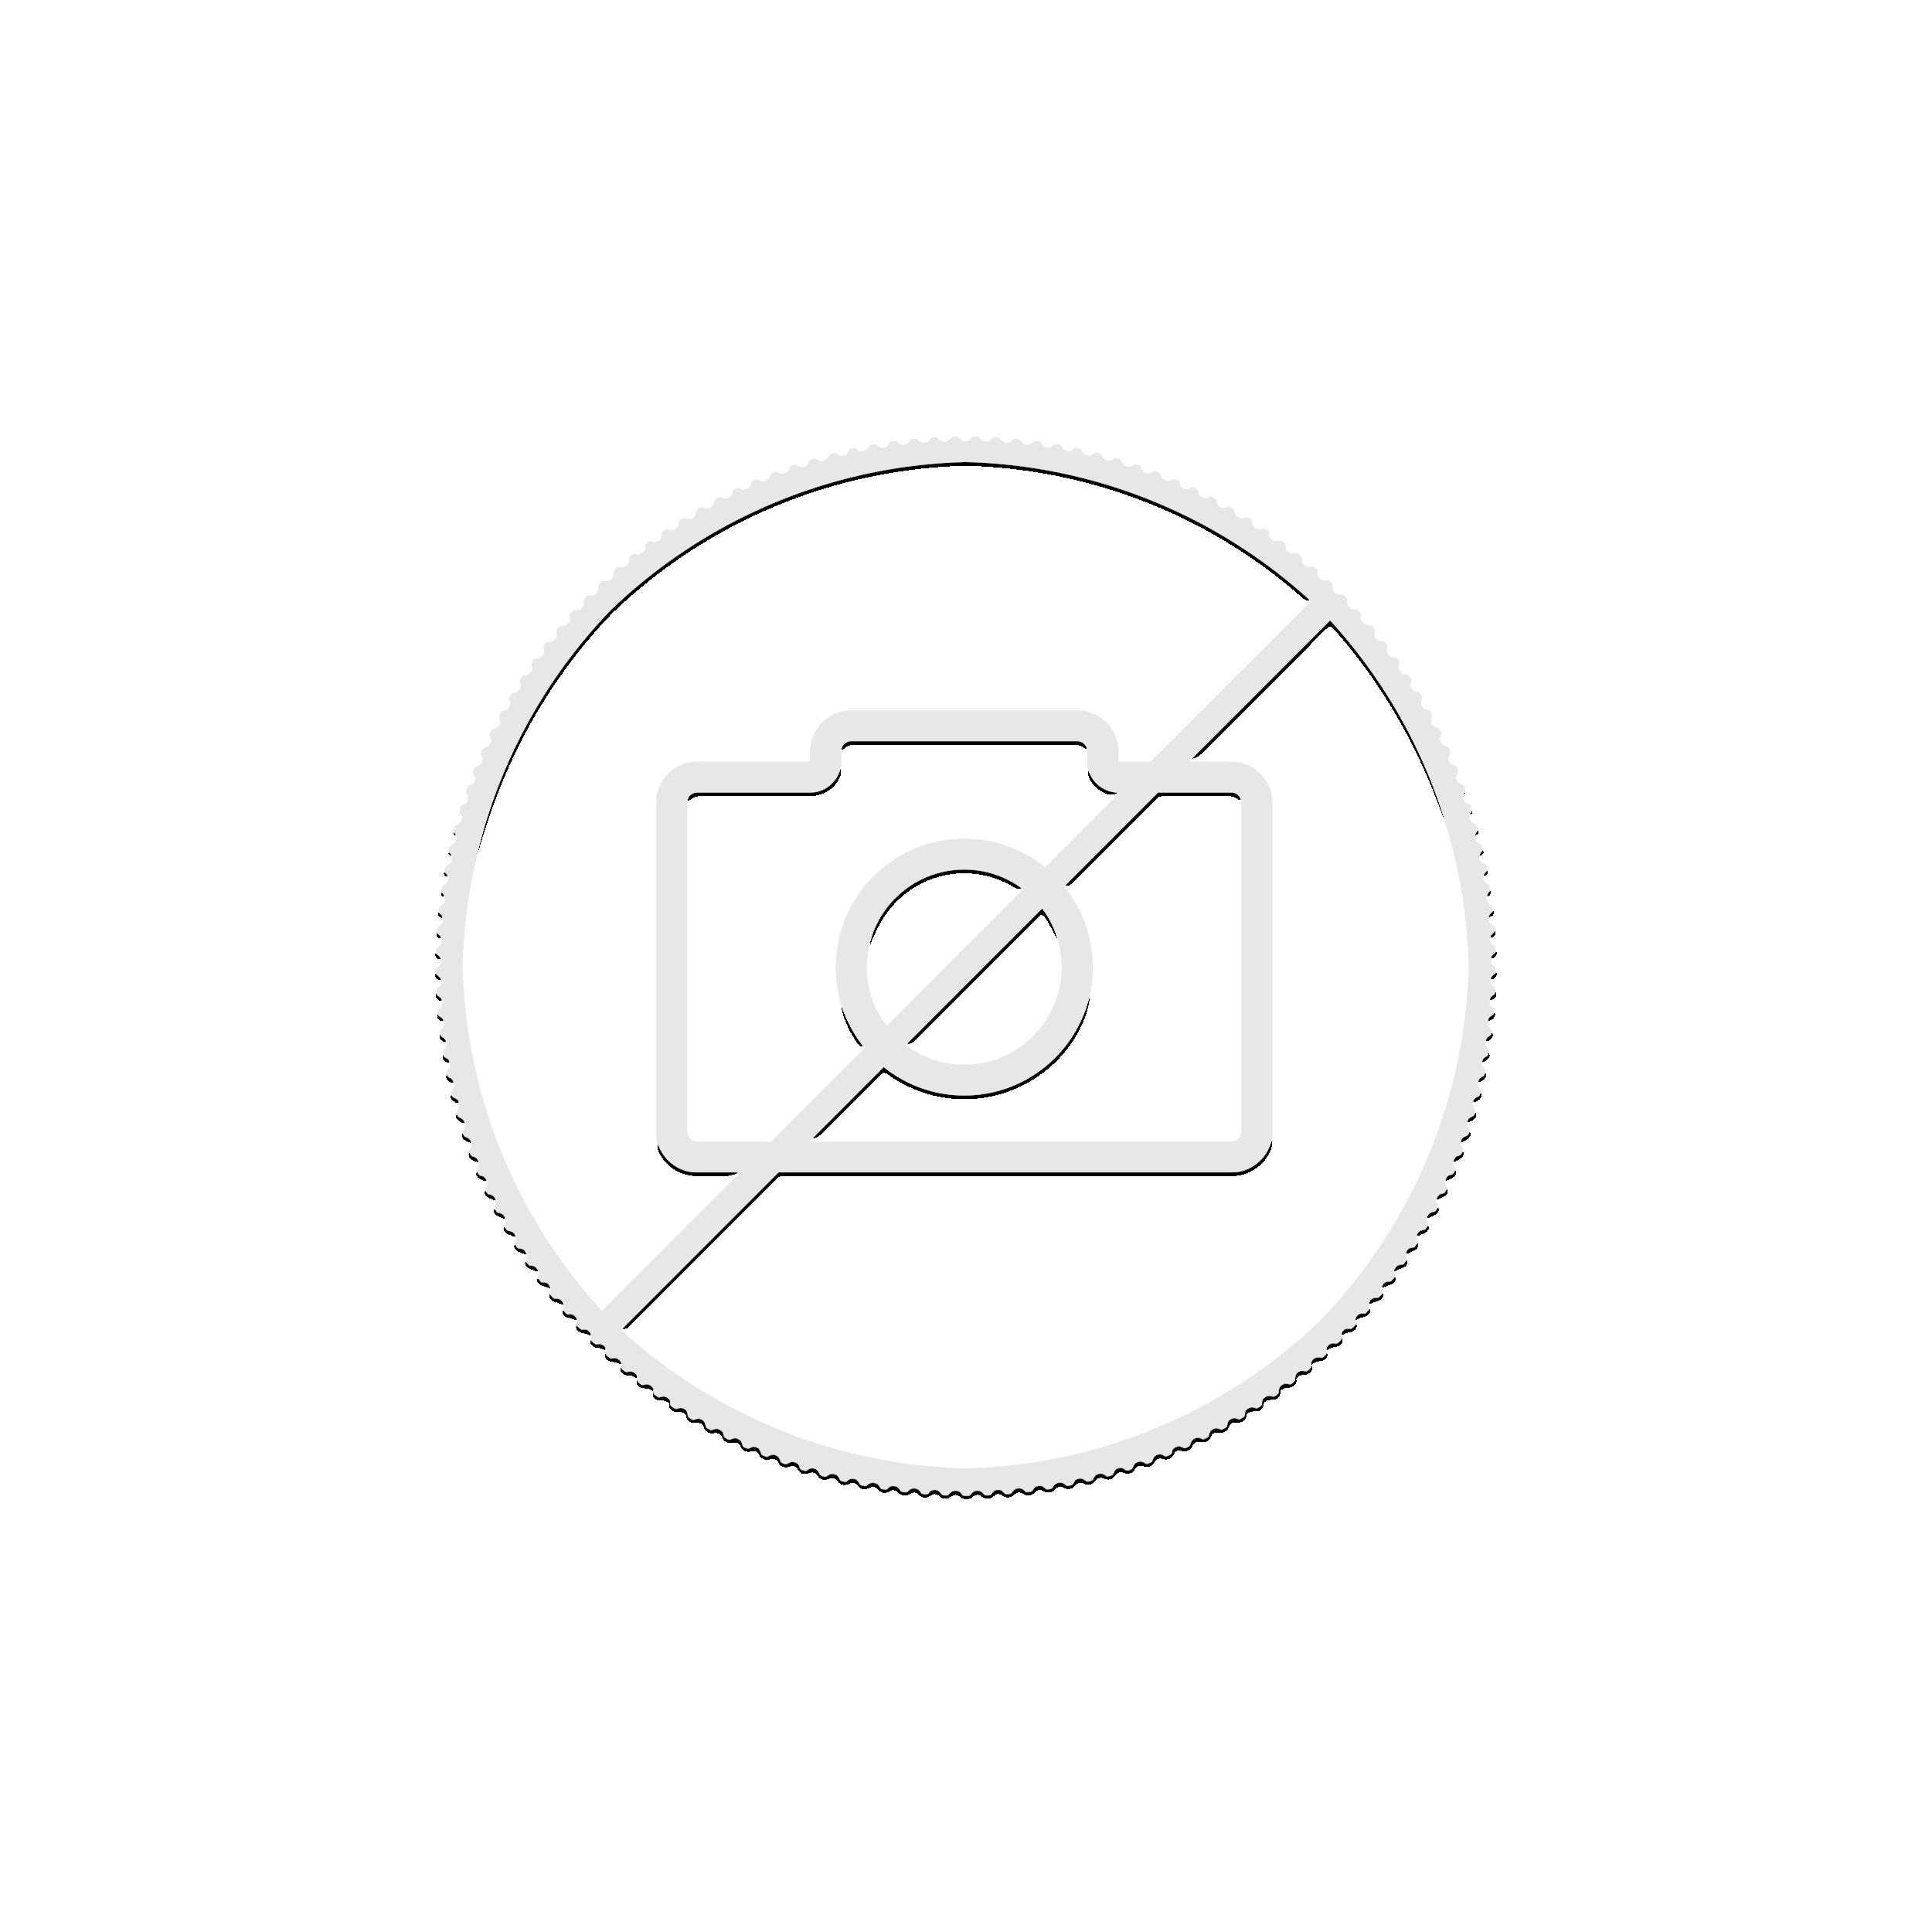 1 troy ounce zilveren munt Bitcoin 2021